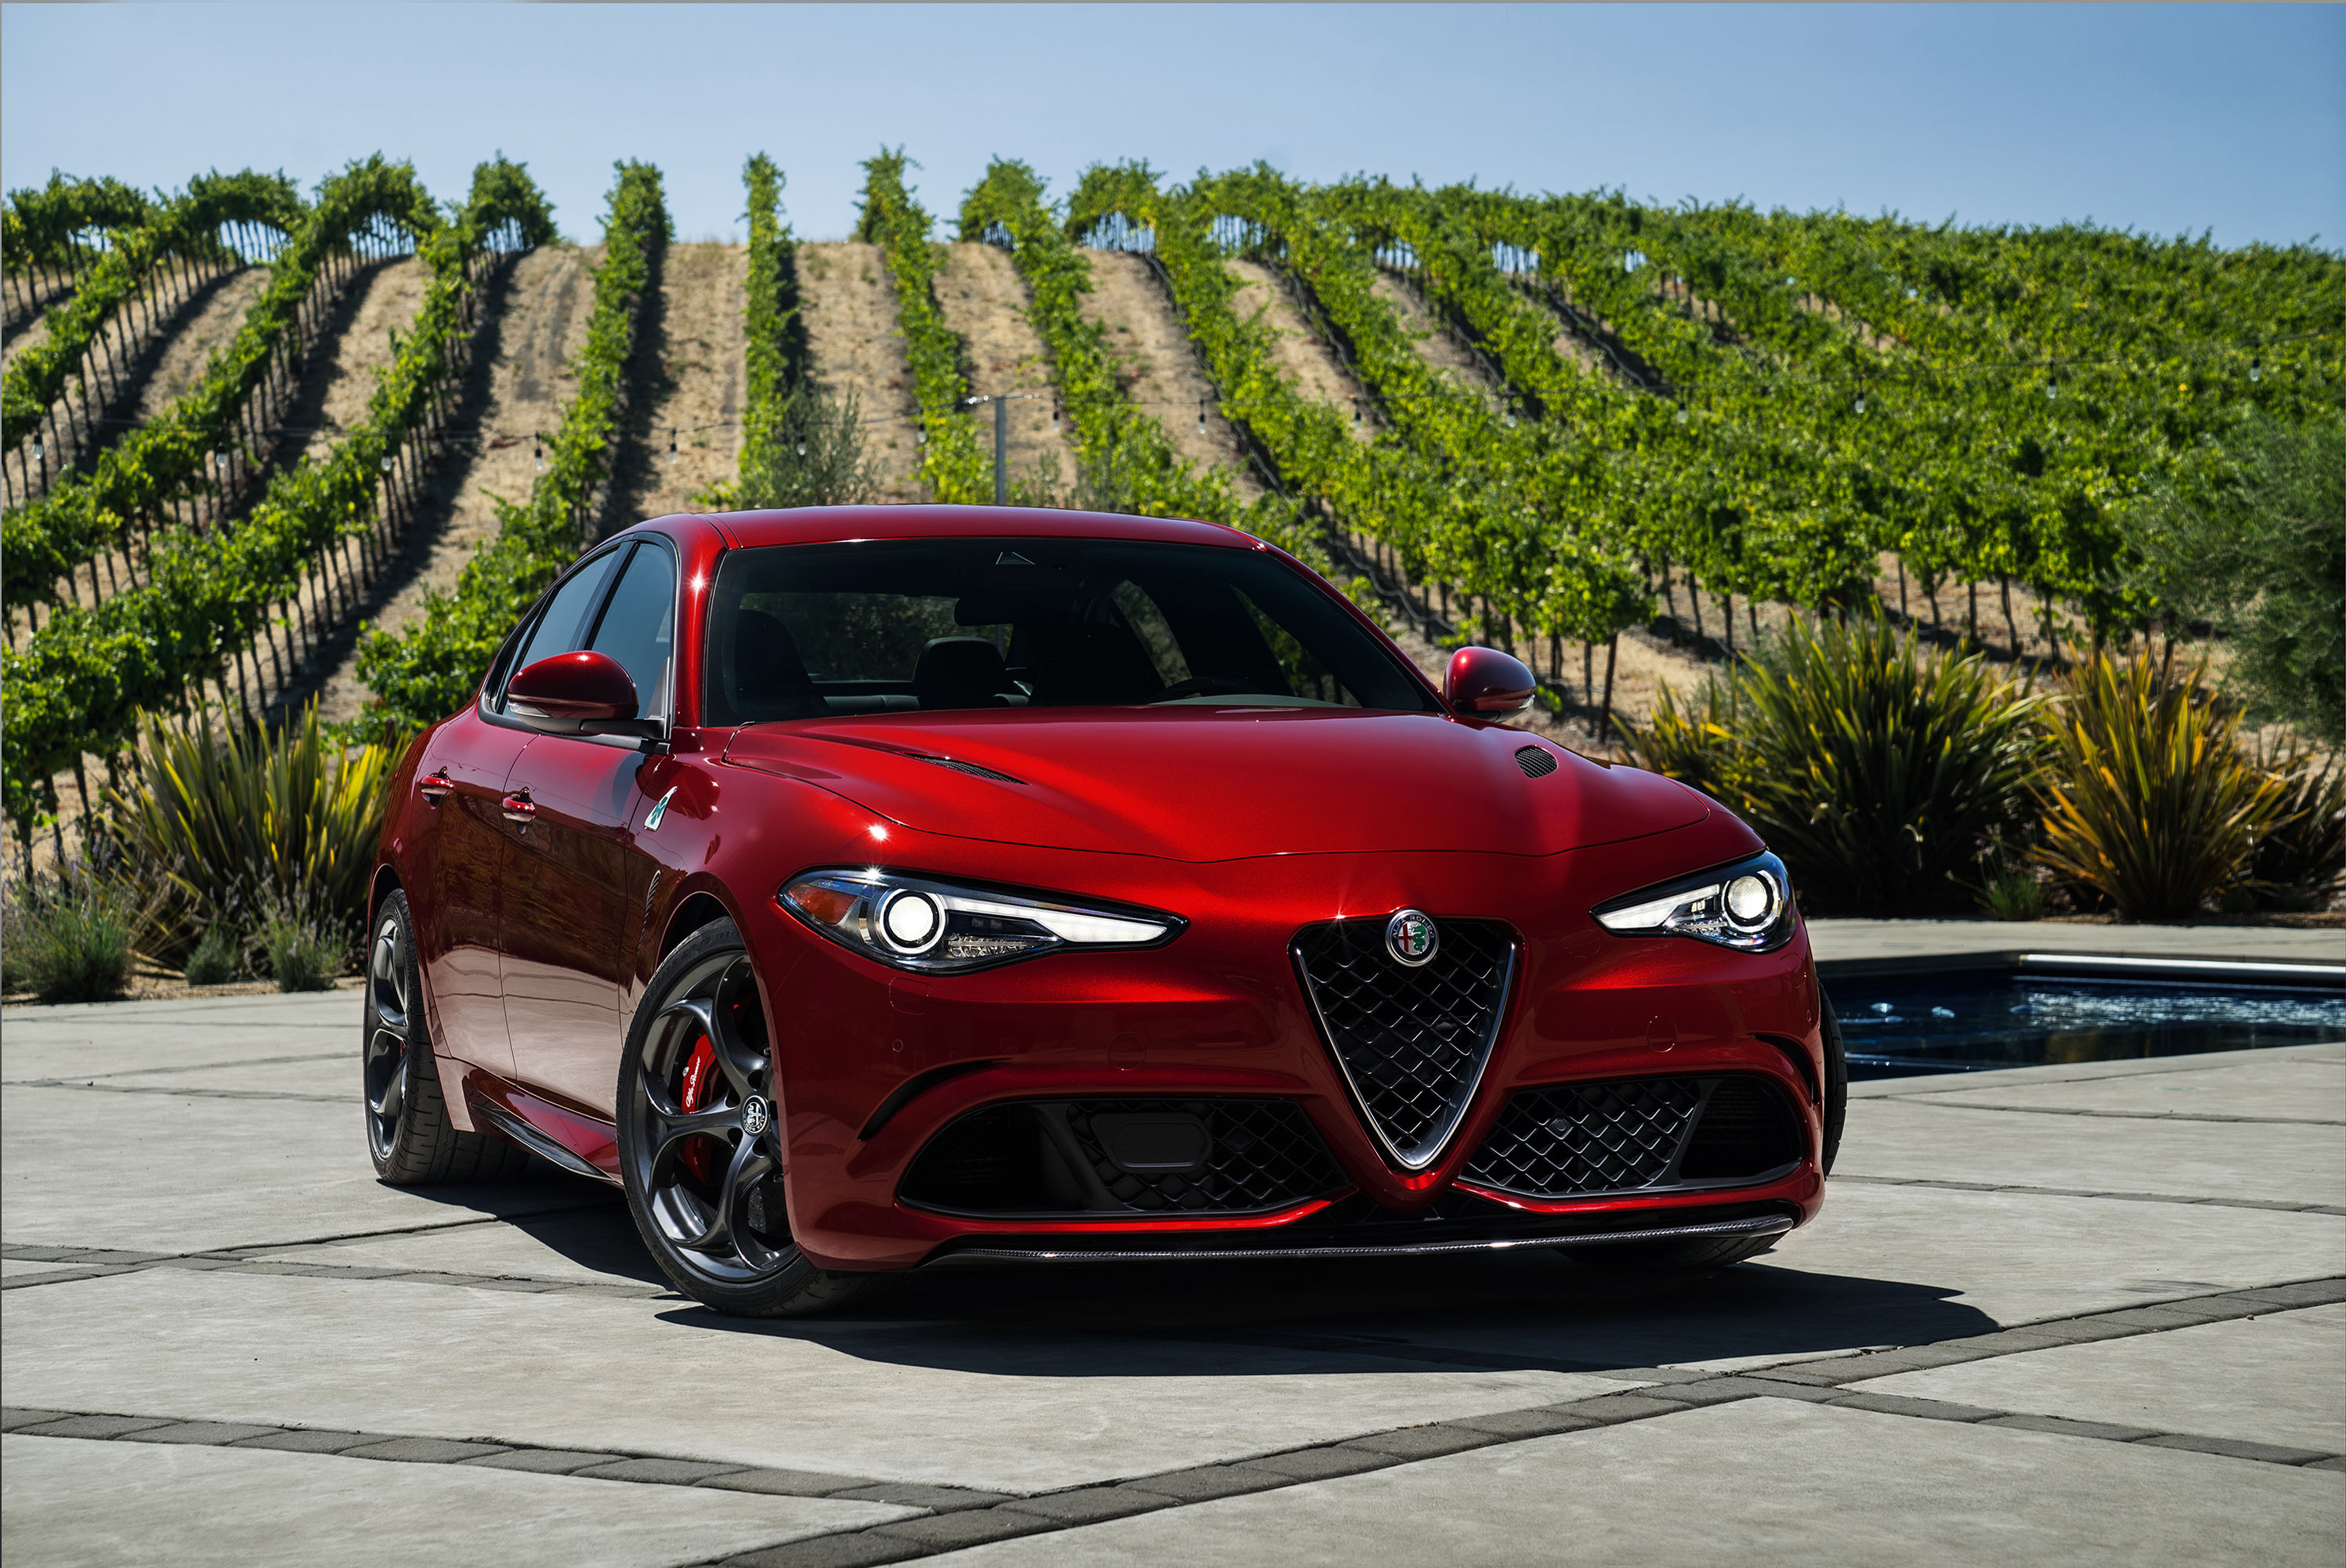 2018 Alfa Romeo Giulia Vs 2018 Bmw 3 Series Compare Cars